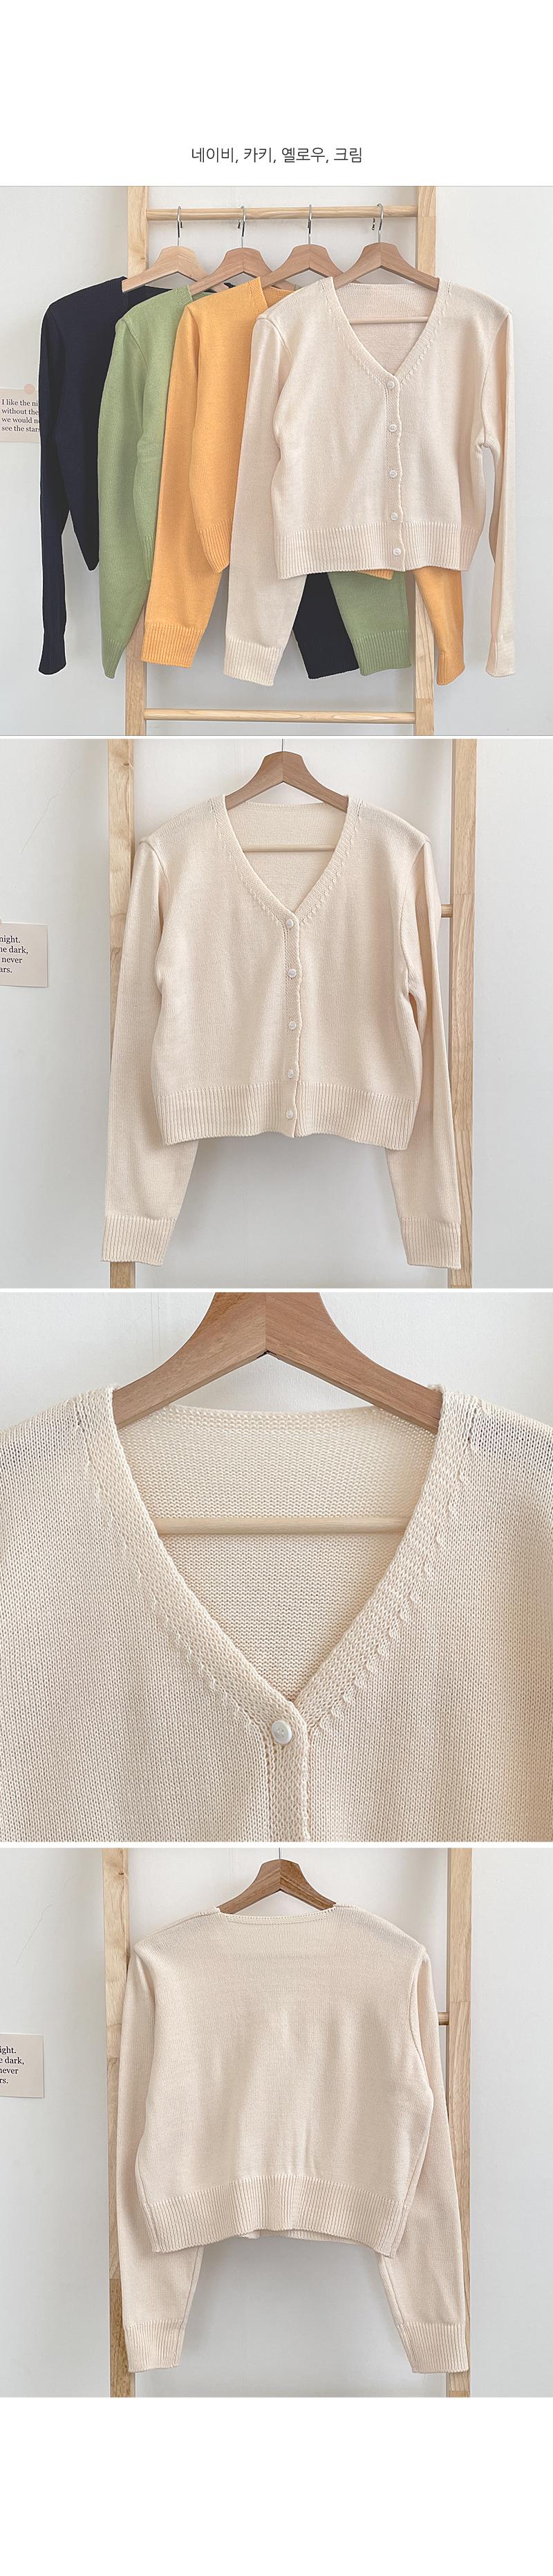 Slush Knitwear Cardigan